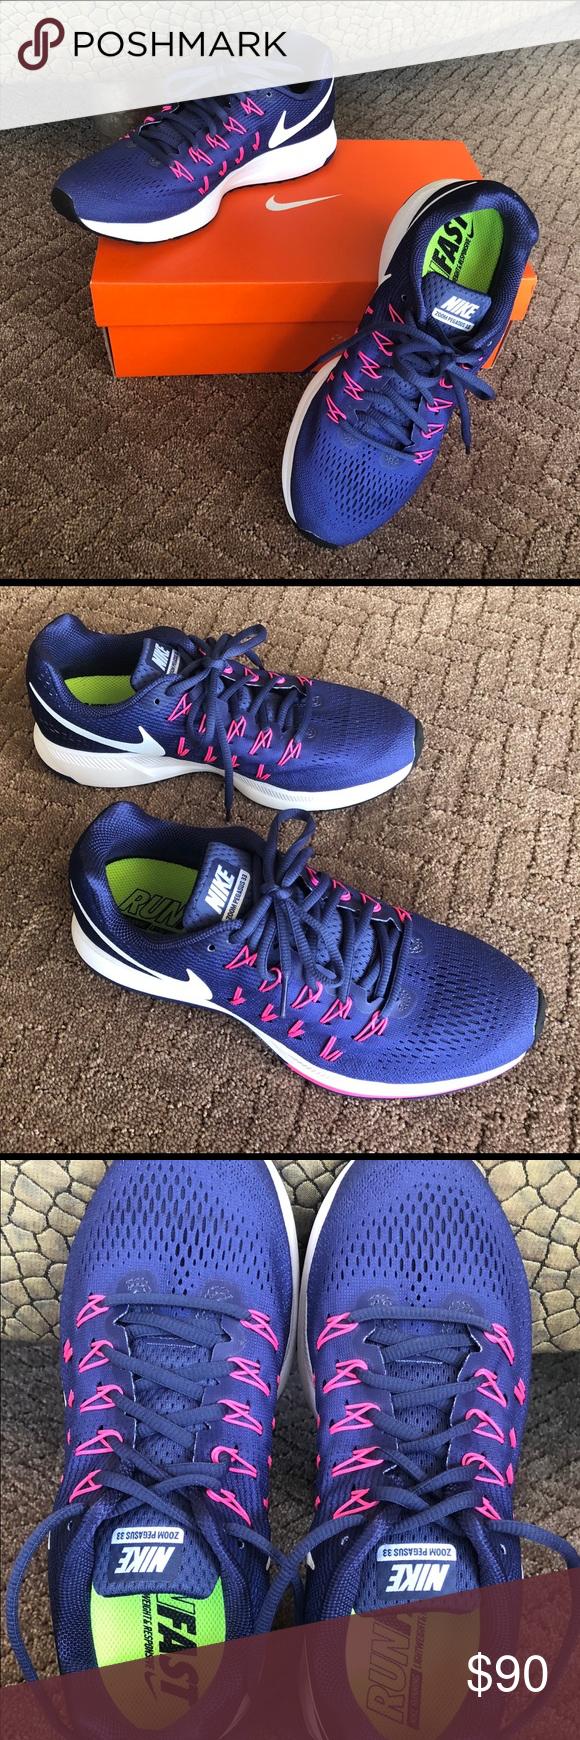 Araña de tela en embudo Apretar Confesión  🆕 NIKE Air Zoom Pegasus 33 Women's Running Size 9 | Nike air zoom pegasus,  Pink running shoes, Air zoom